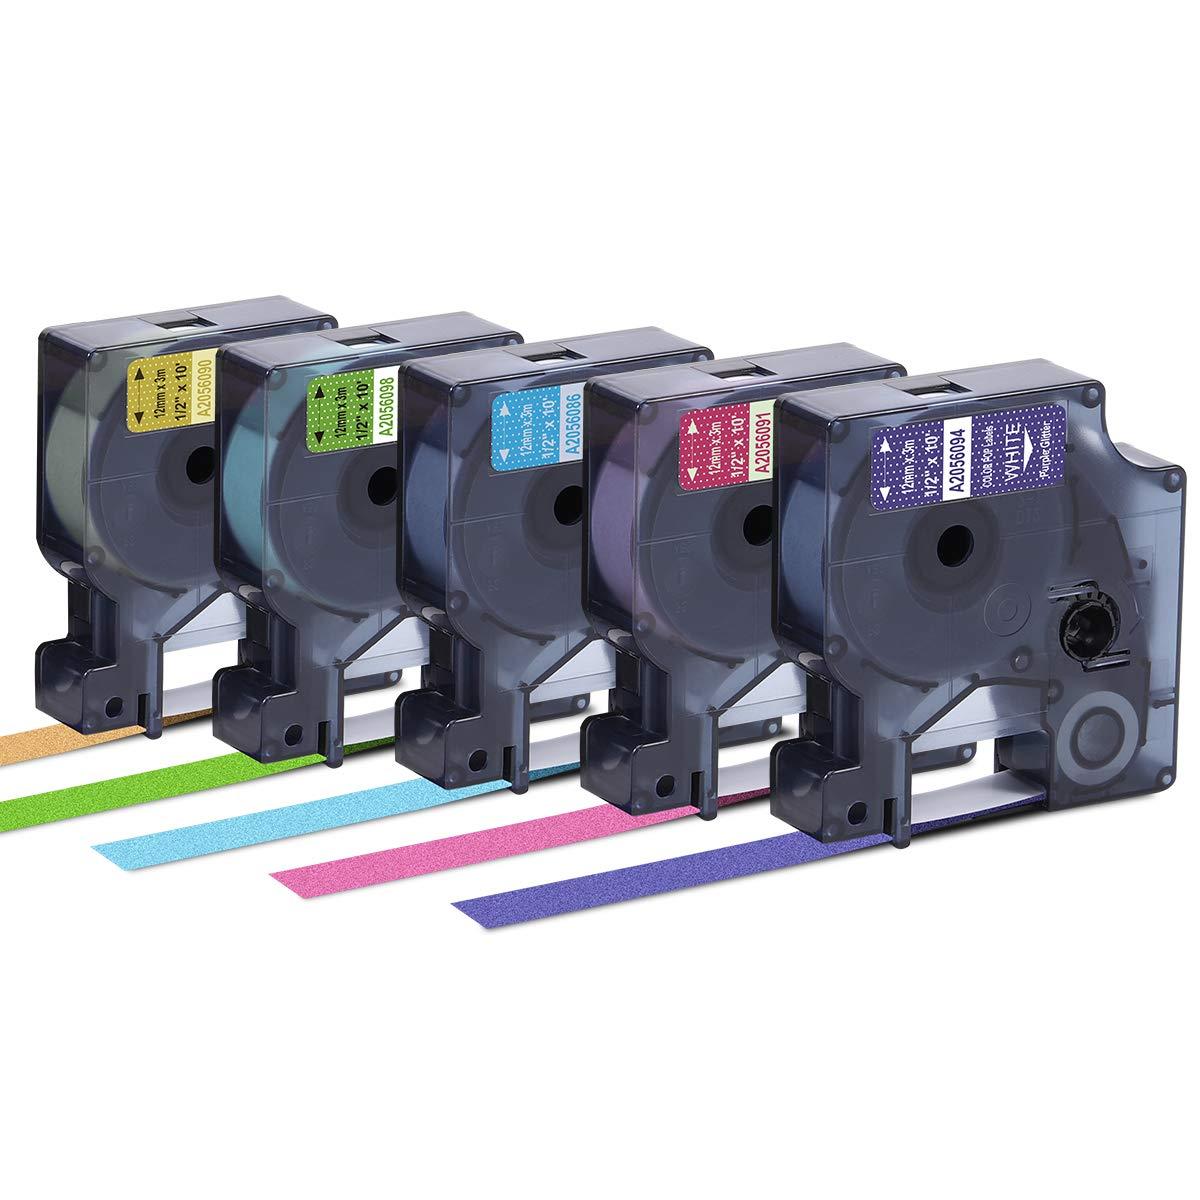 "Oozmas Compatible Label Tape Replacement for DYMO COLORPOP Label Tape - D1 Label Maker Cassette 1/2"" W x 10' L- Work for DYMO COLORPOP, LabelManager 160 280 360D 420P, Muticolor Glitter, 5-Pack"